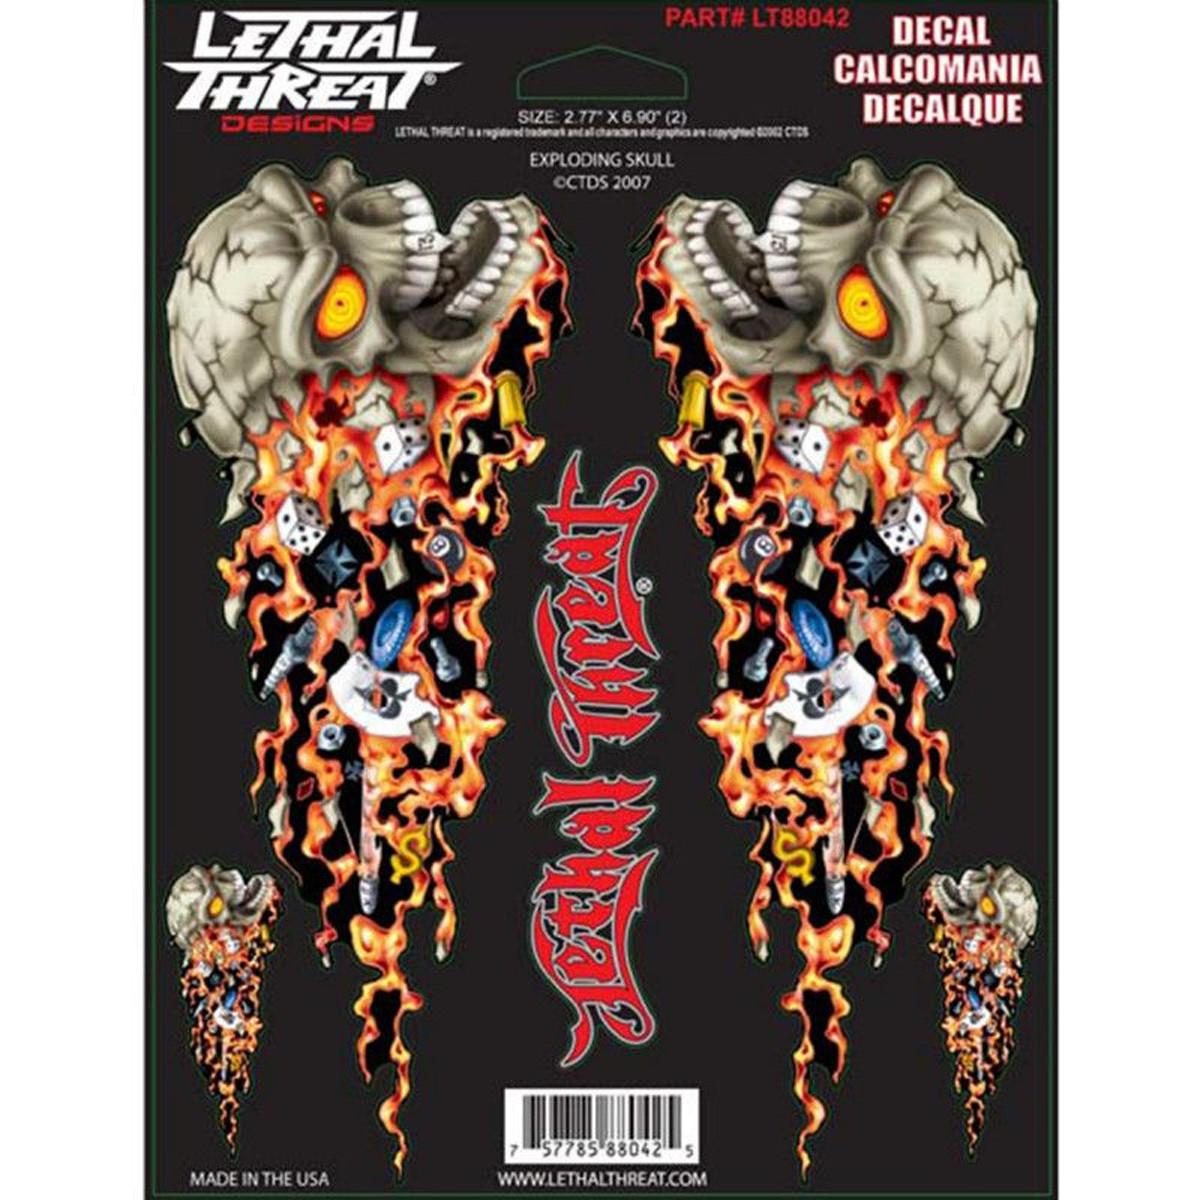 Autocollant / Sticker - LETHAL THREAT Exploding Skull 15 x 20cm